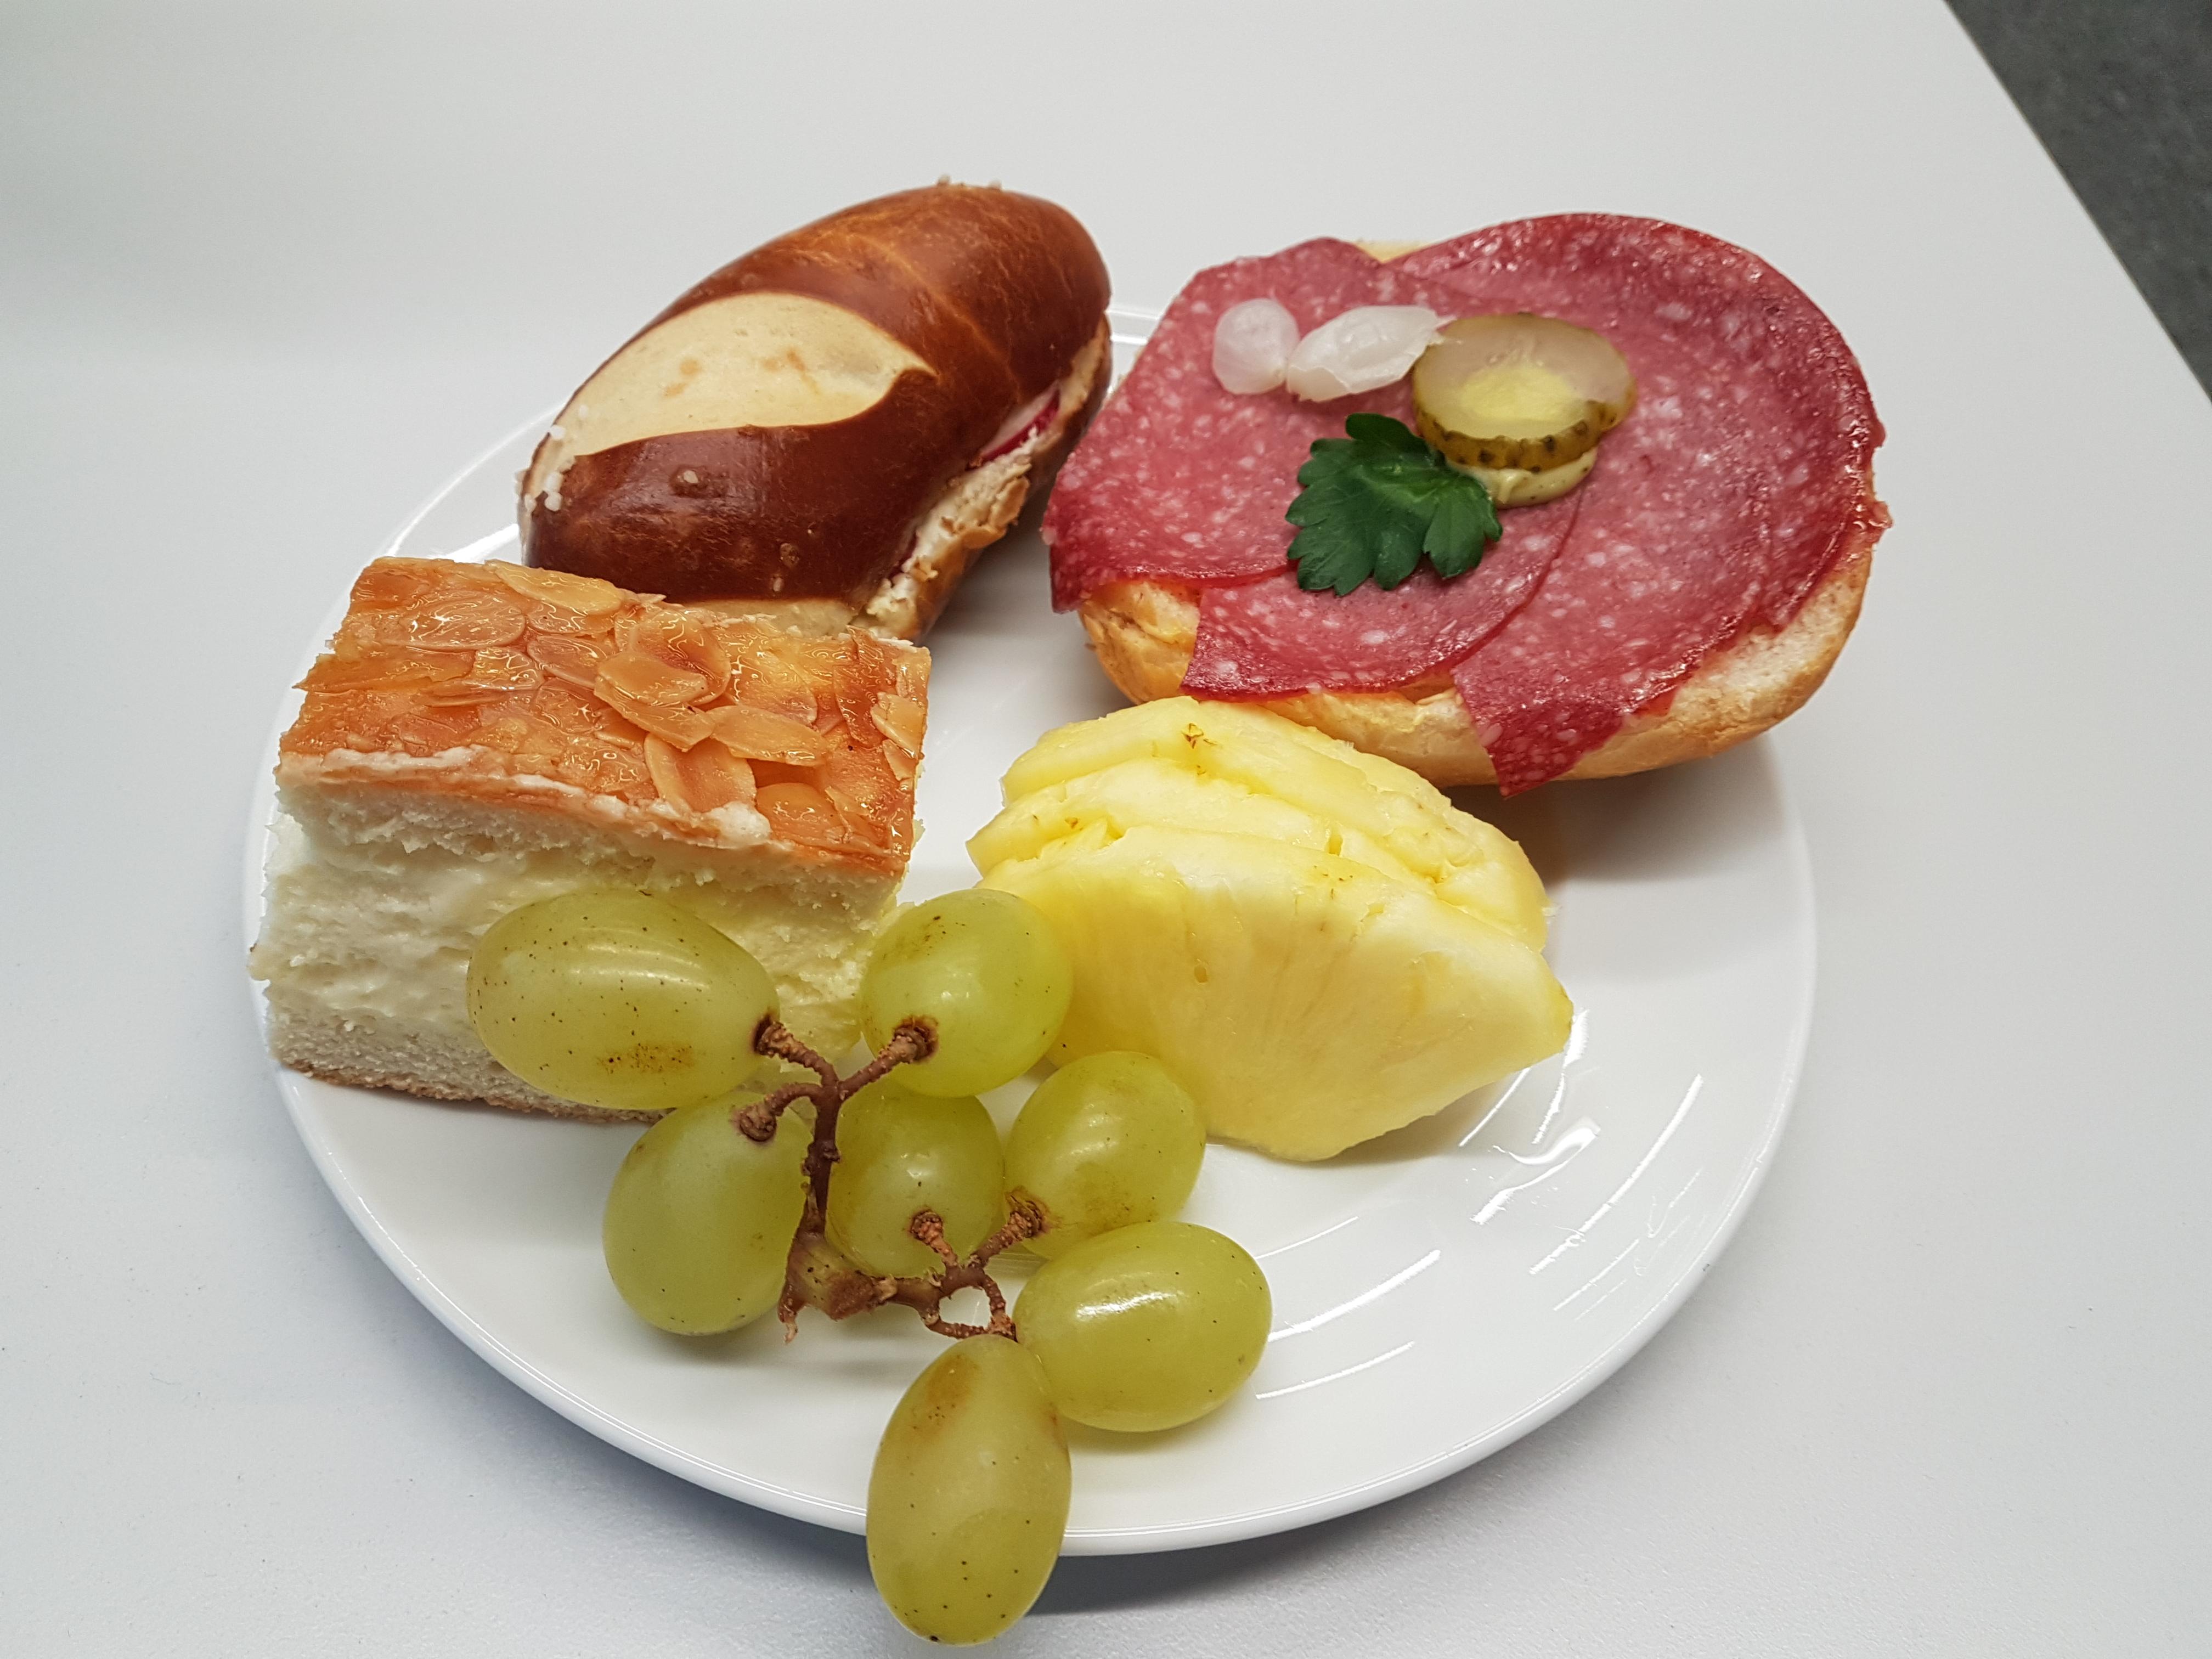 https://foodloader.net/Holz_2018-11-30_Snacks.jpg